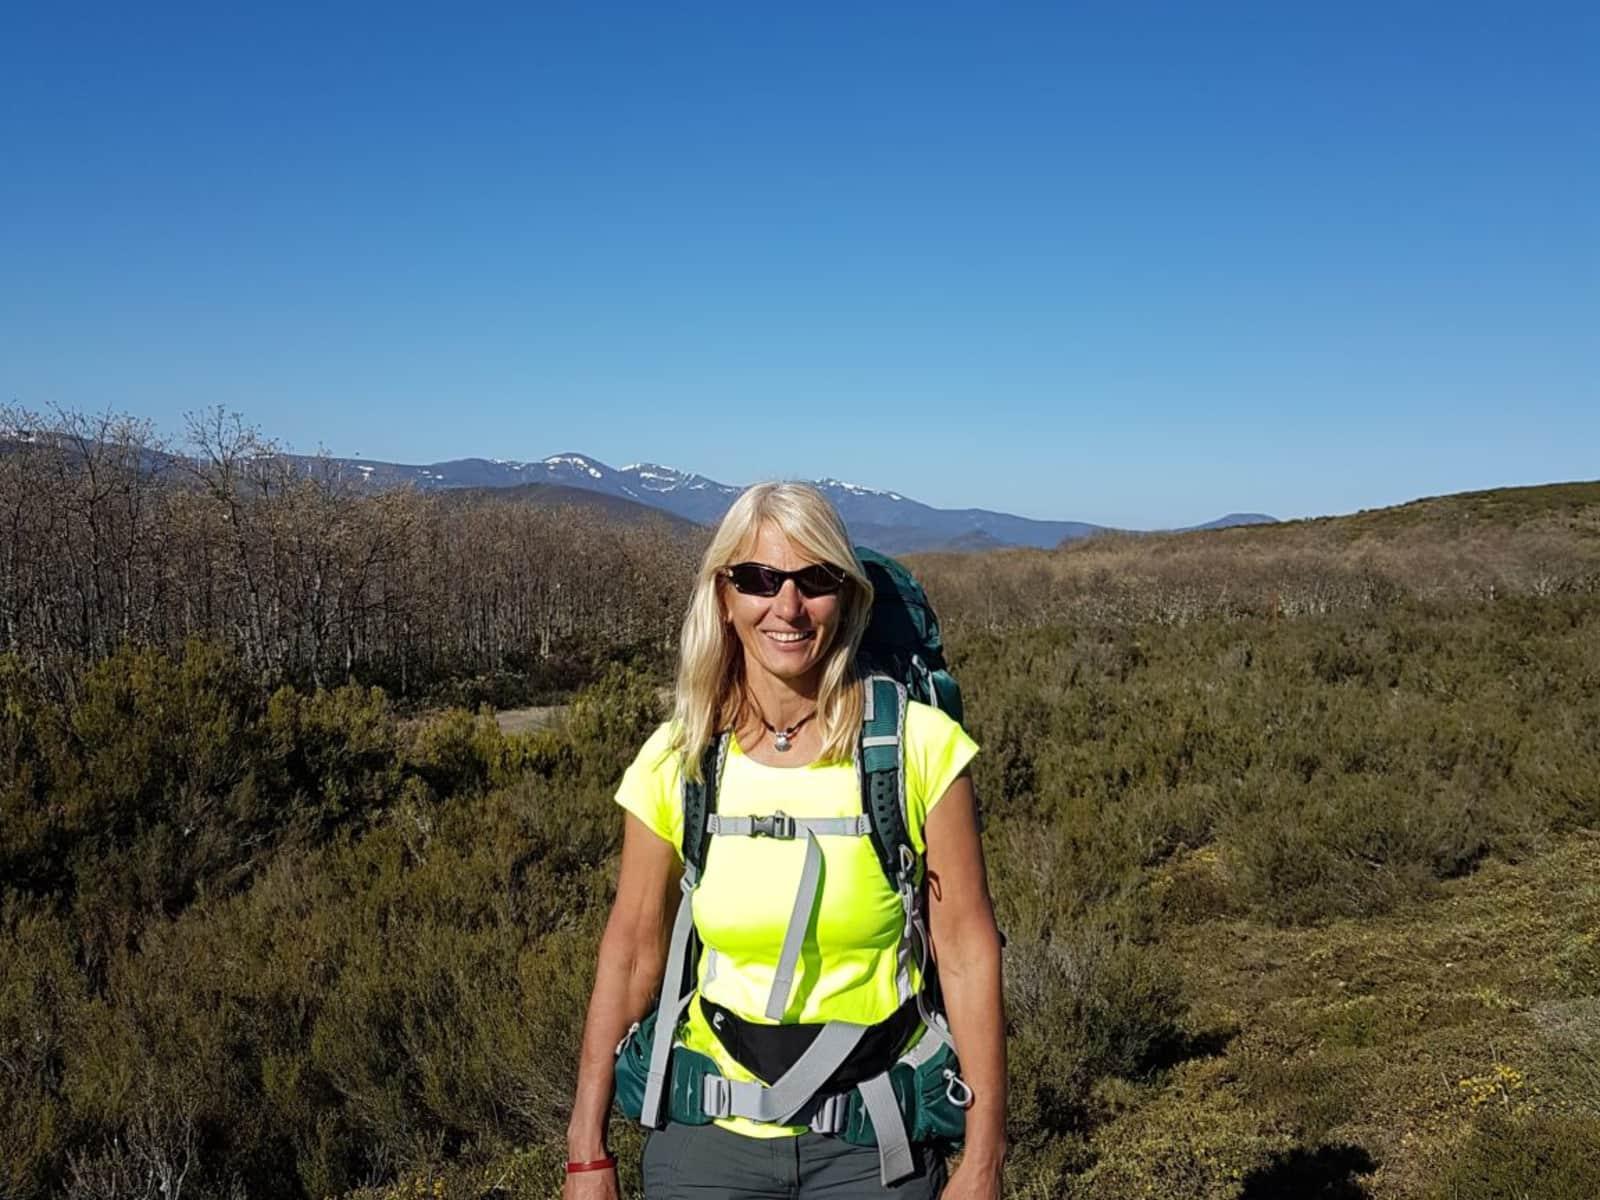 Carol from Canberra, Australian Capital Territory, Australia